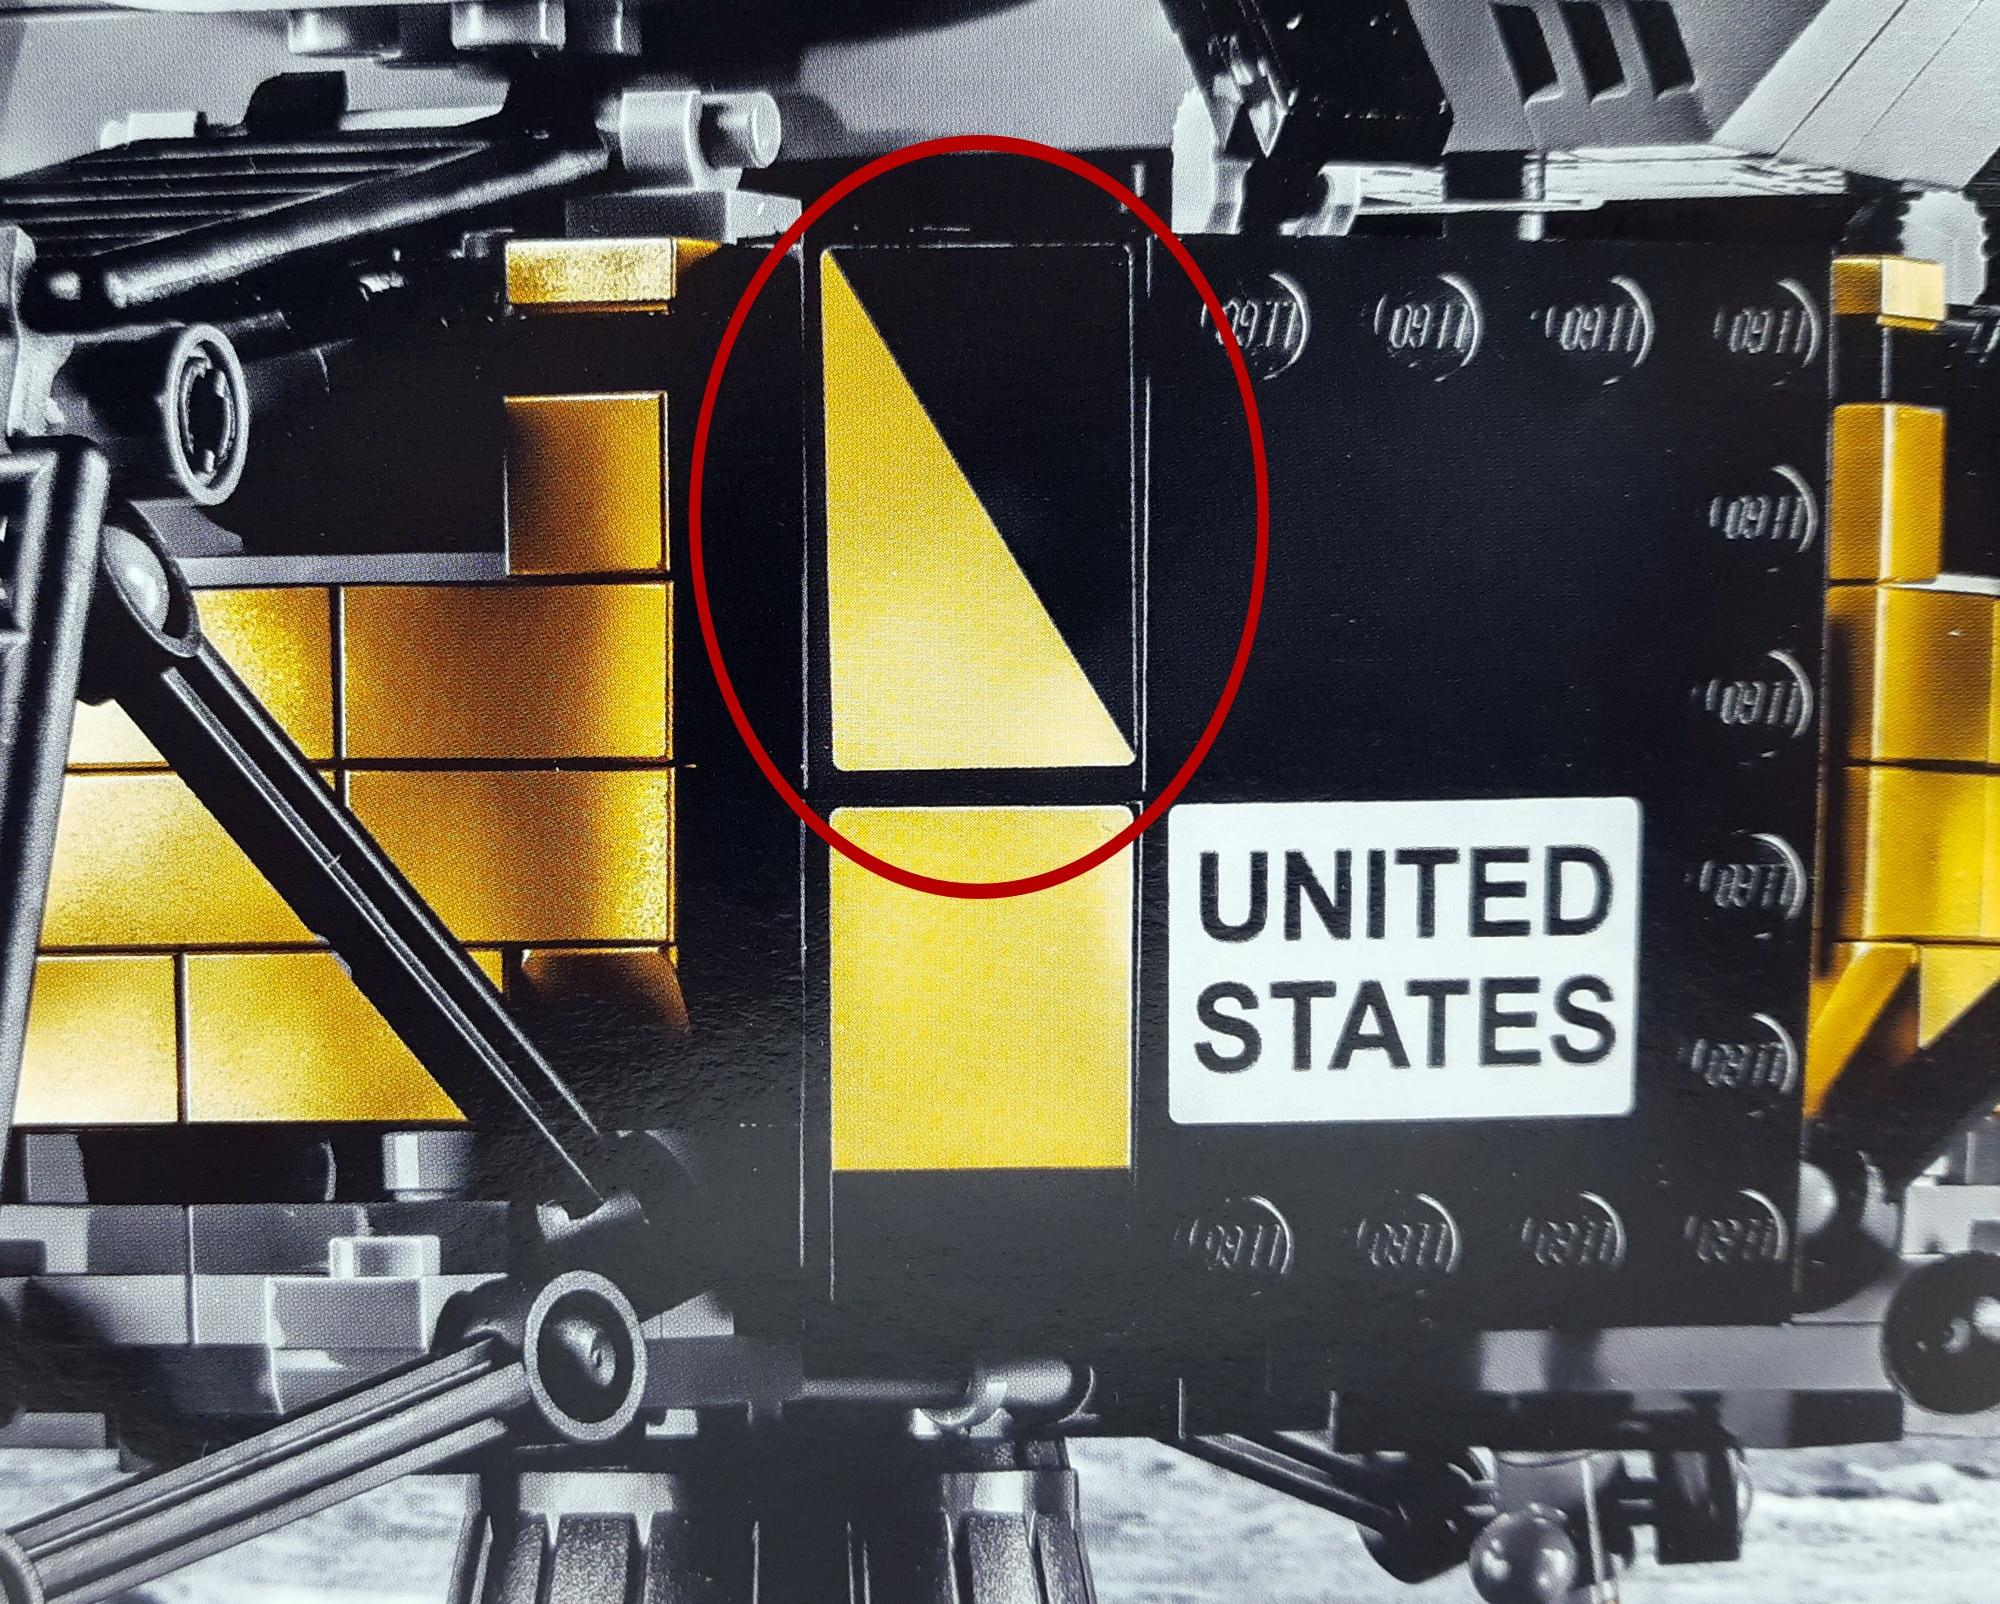 LEGO 10266 Nasa Apollo 11 Mondlandefähre - Box mit schiefem Aufkleber